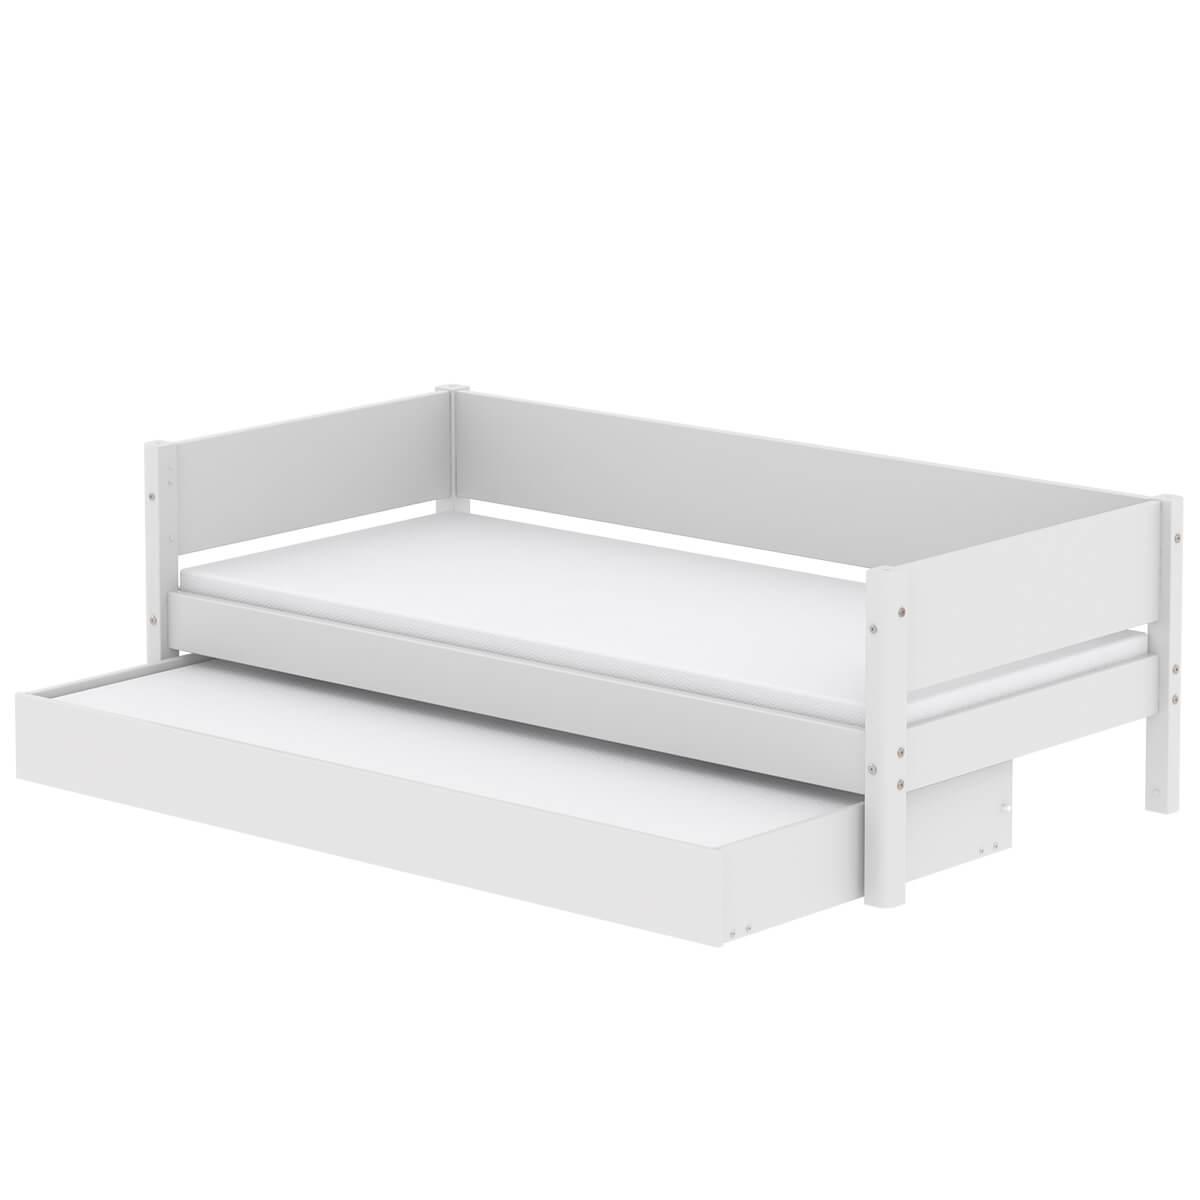 Cama infantil 90x190cm nido WHITE Flexa blanco